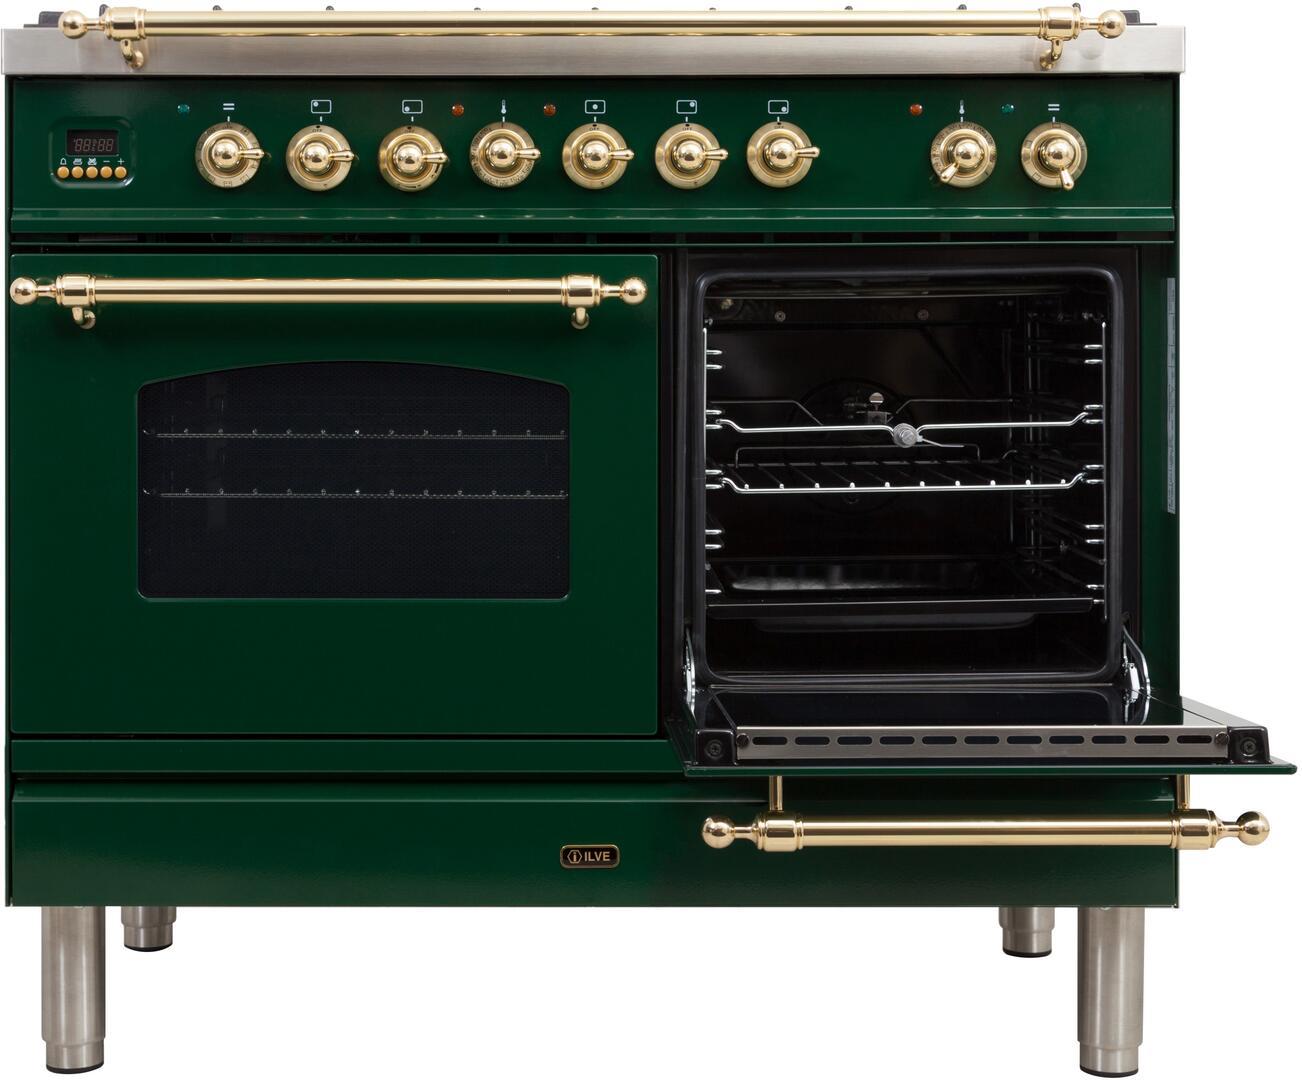 Ilve Nostalgie UPDN100FDMPVSLP Freestanding Dual Fuel Range Green, UPDN100FDMPVSLP Secondary Oven Opened